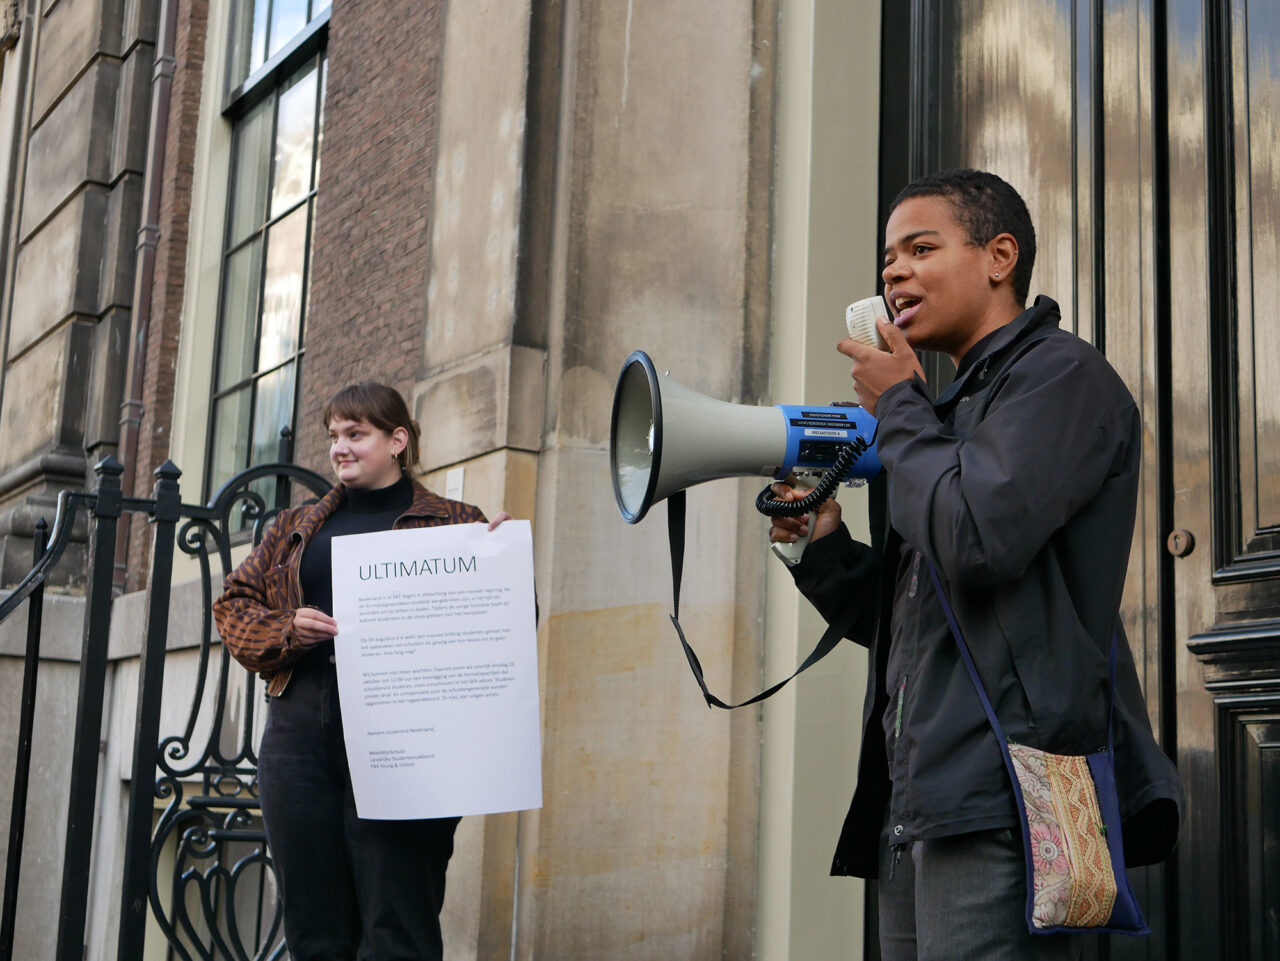 Ama-boahene-landelijke-studenten-vakbond-lsvb-formatie-leenstelsel-ultimatum-protest-lsvb-1